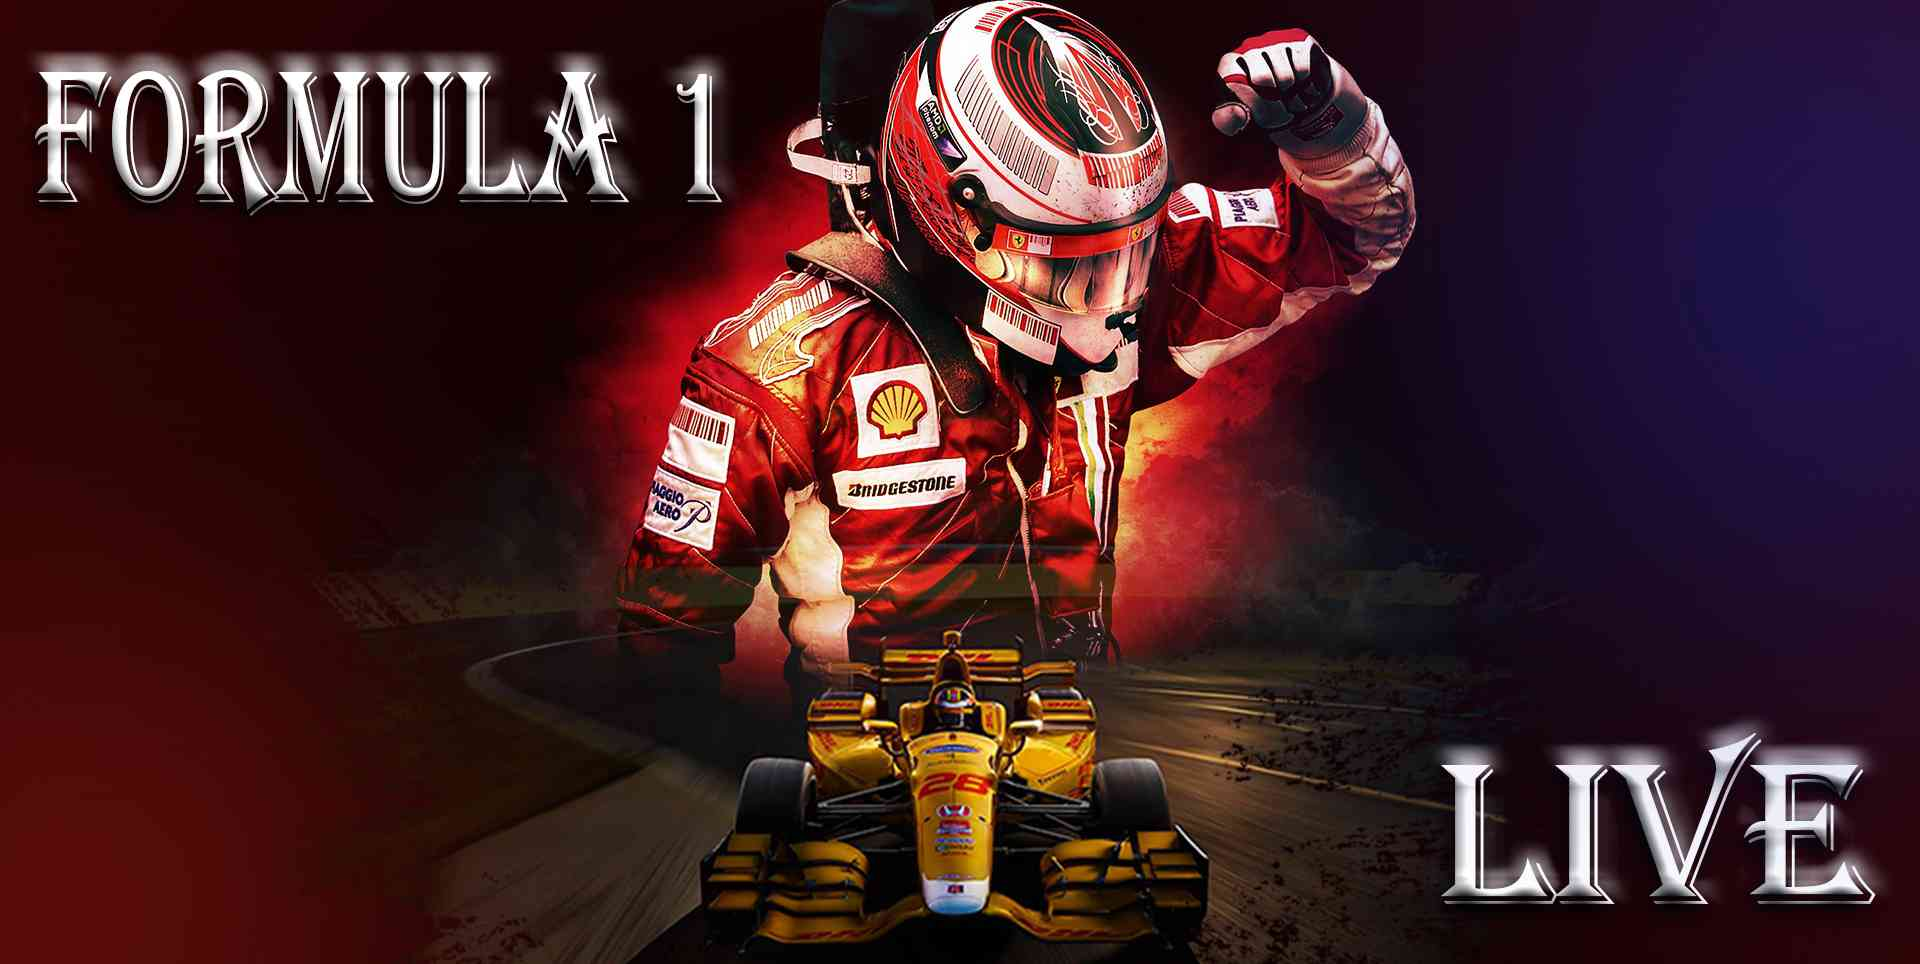 Live Ferrari Challenge Race Mugello Circuit Italy